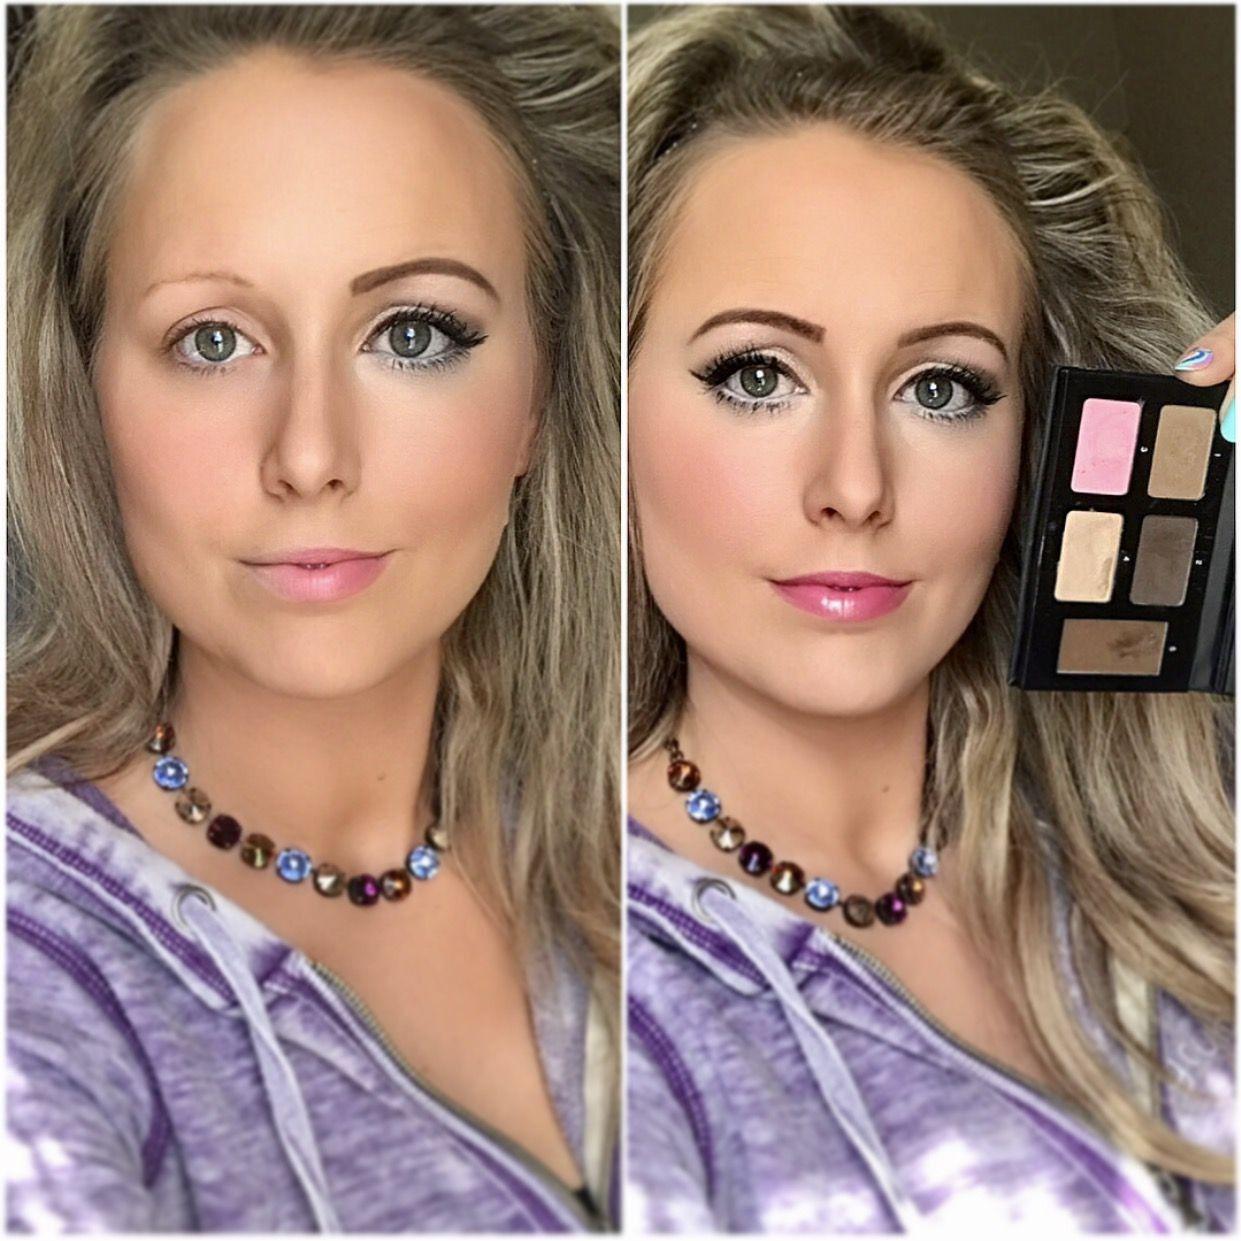 Eye Makeup. Locate the best brow gel, pencil, powder